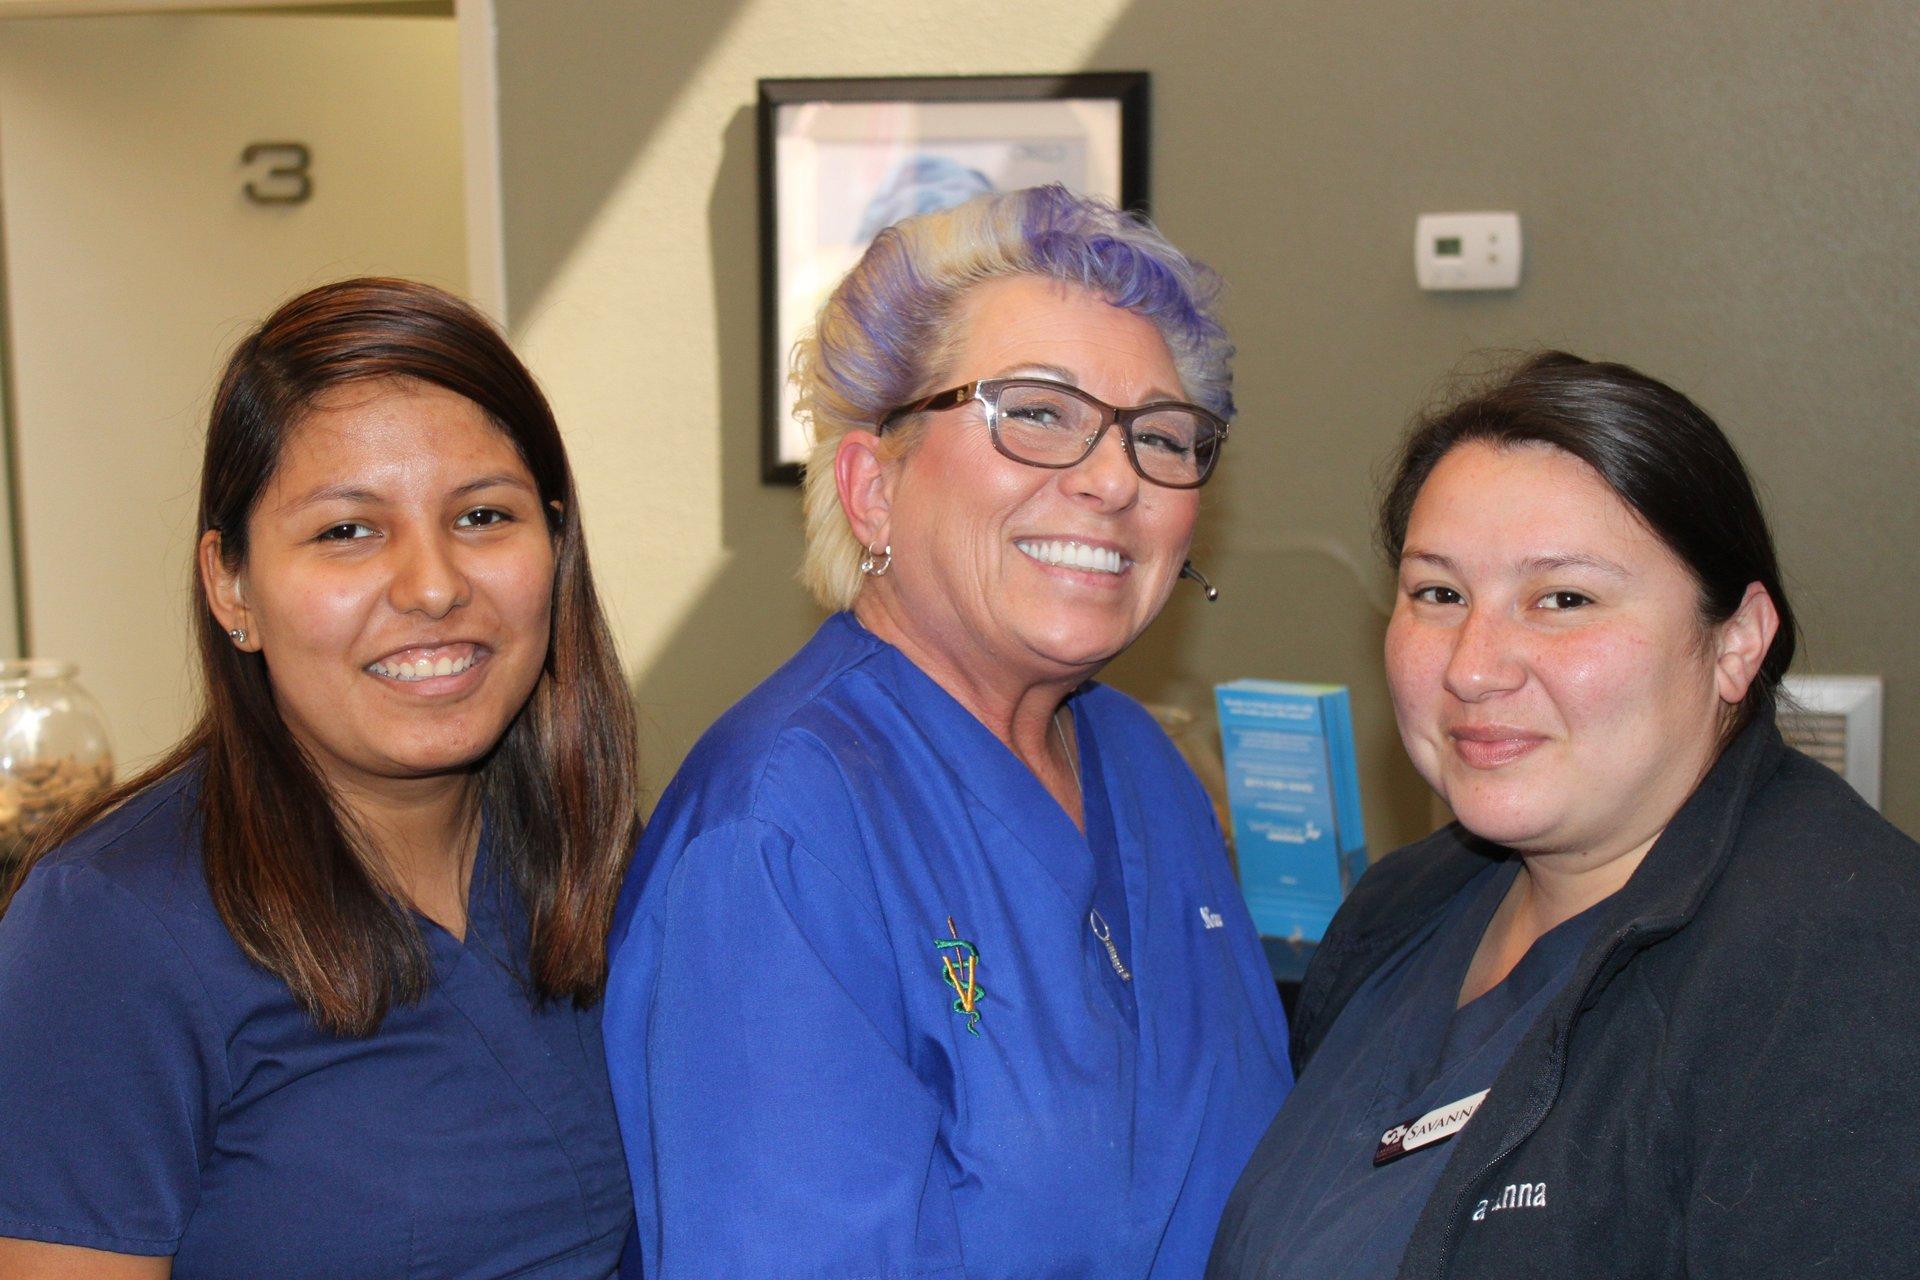 Lakeside Animal Clinic employees - Houston, TX